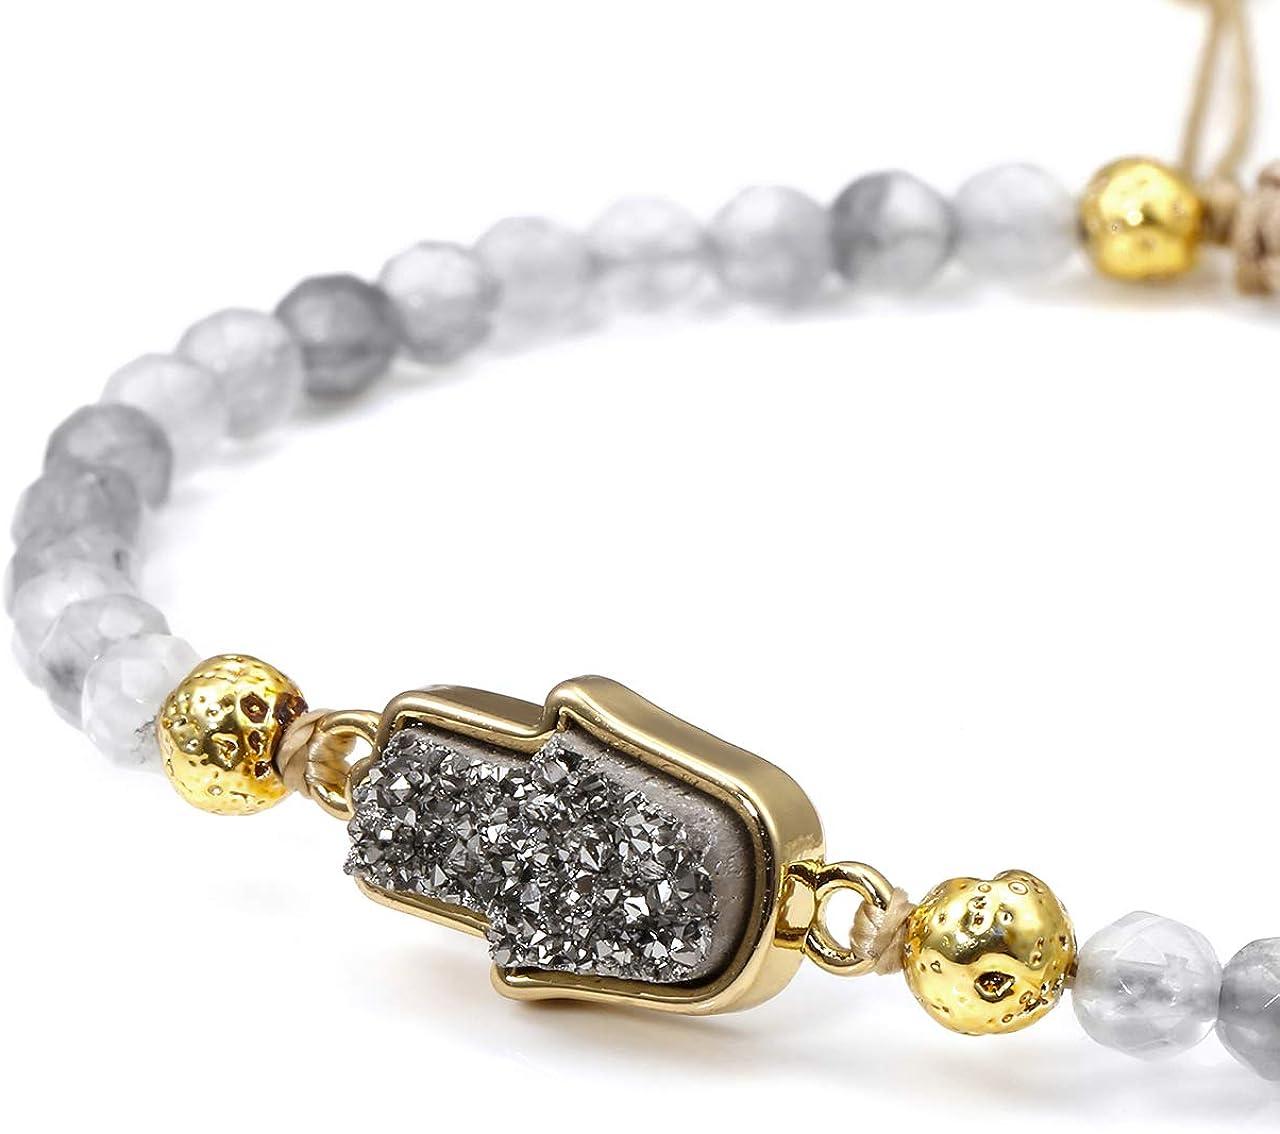 Top Plaza Womens Girls 4mm Beads Chakra Healing Crystal Bracelet Gold Lava Stone Essential Oil Diffuser Adjustable Bracelets with Hamsa Hand Shape Druzy Charm